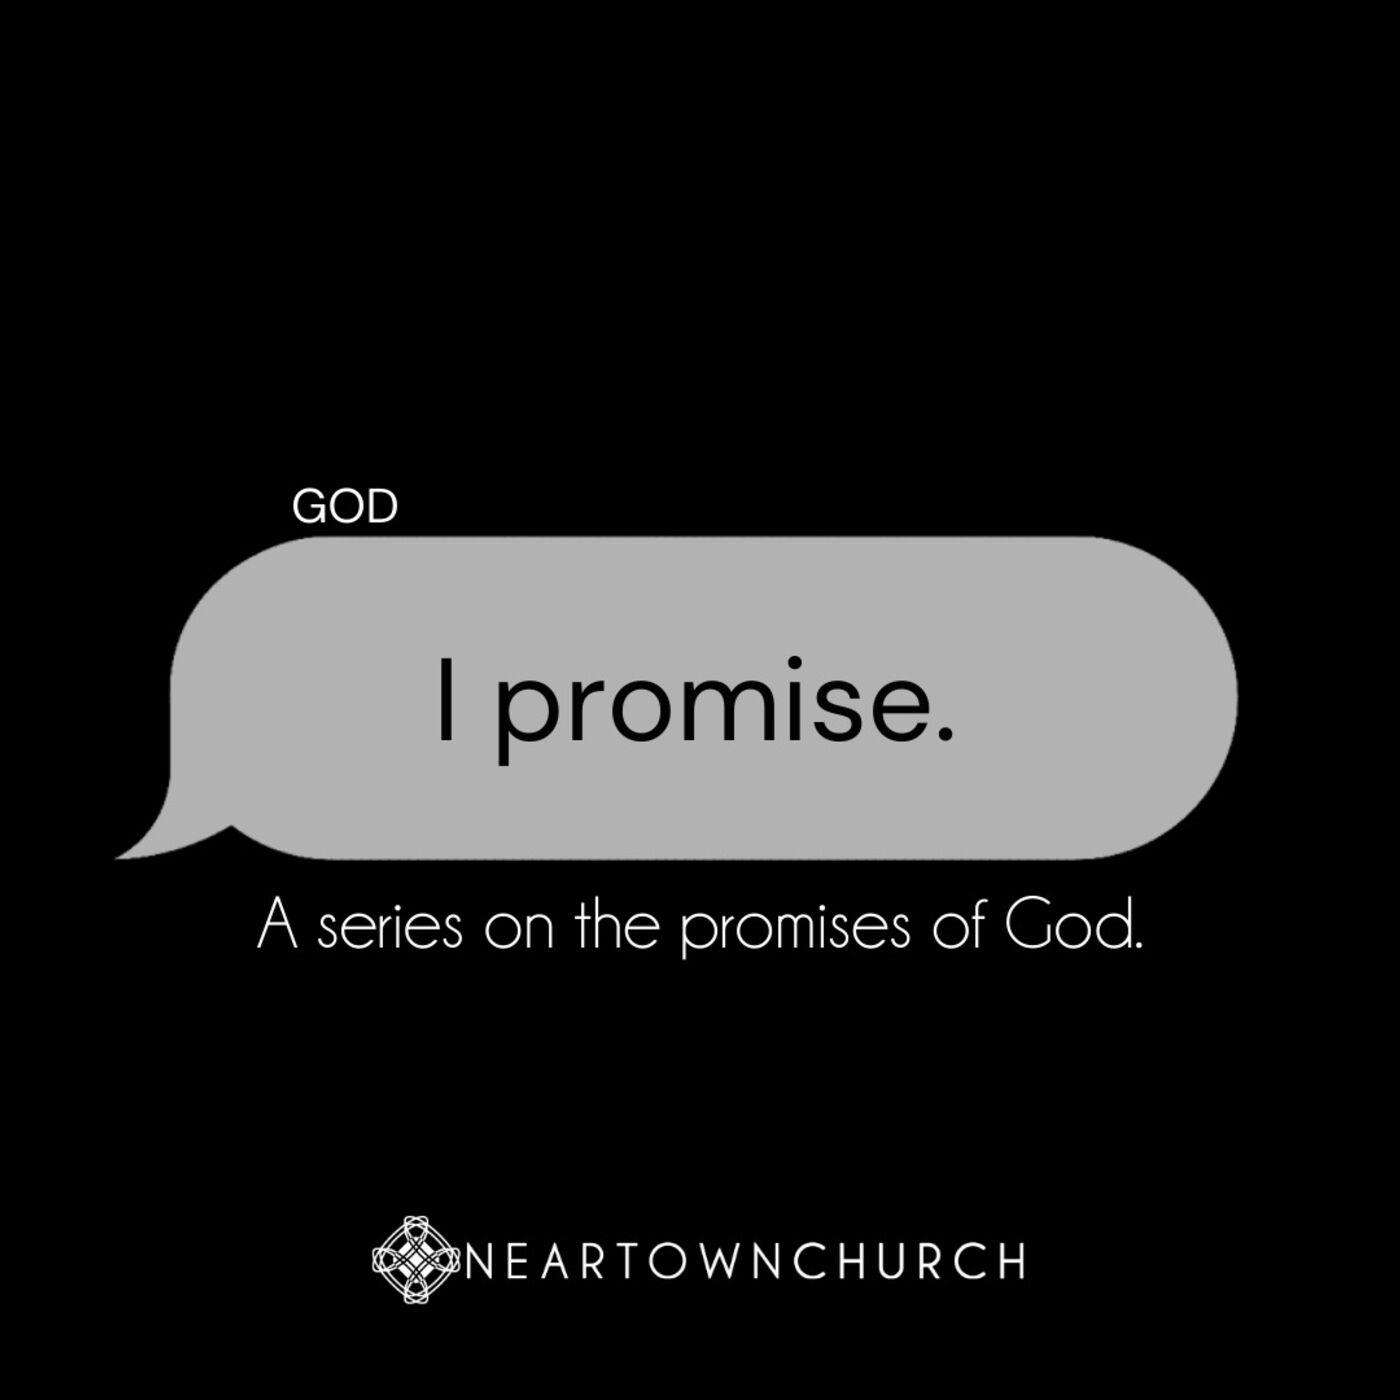 I promise. - 8.23.2020